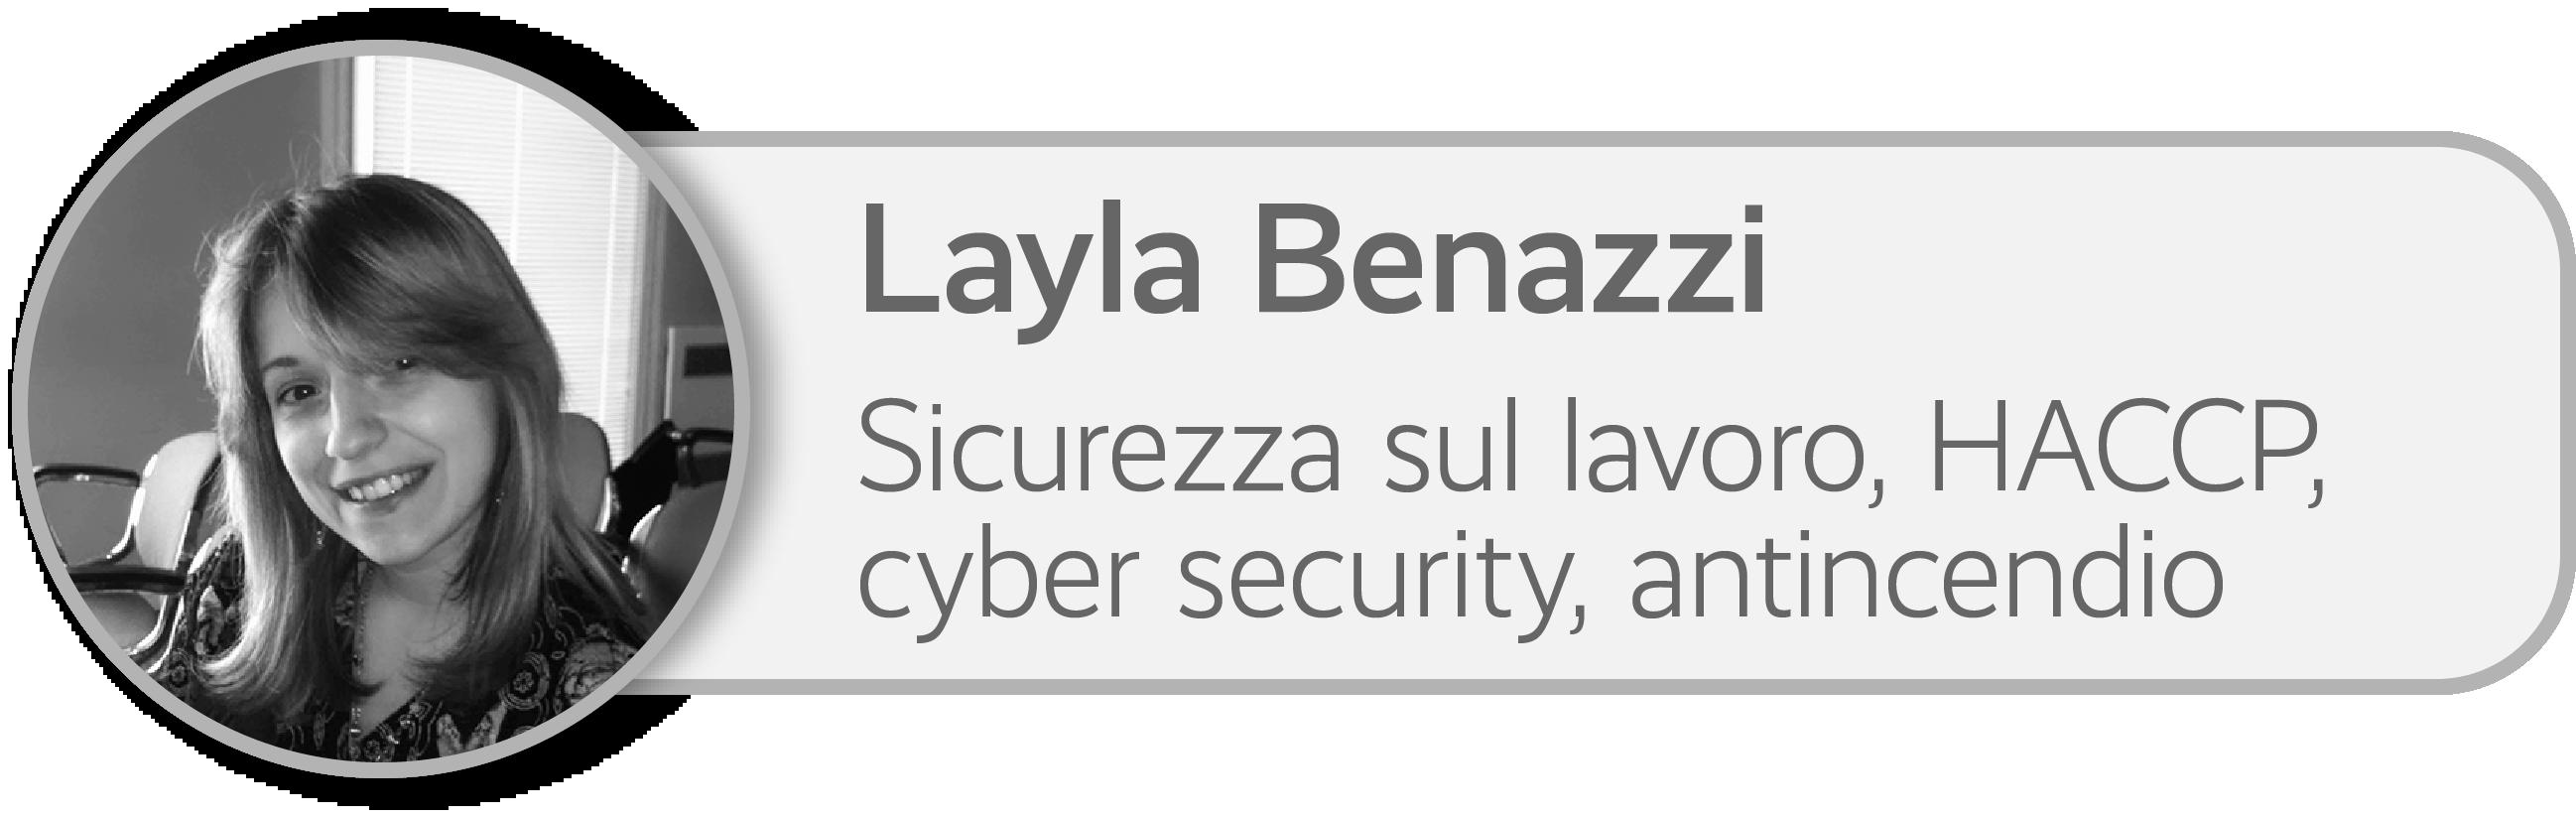 Layla Benazzi